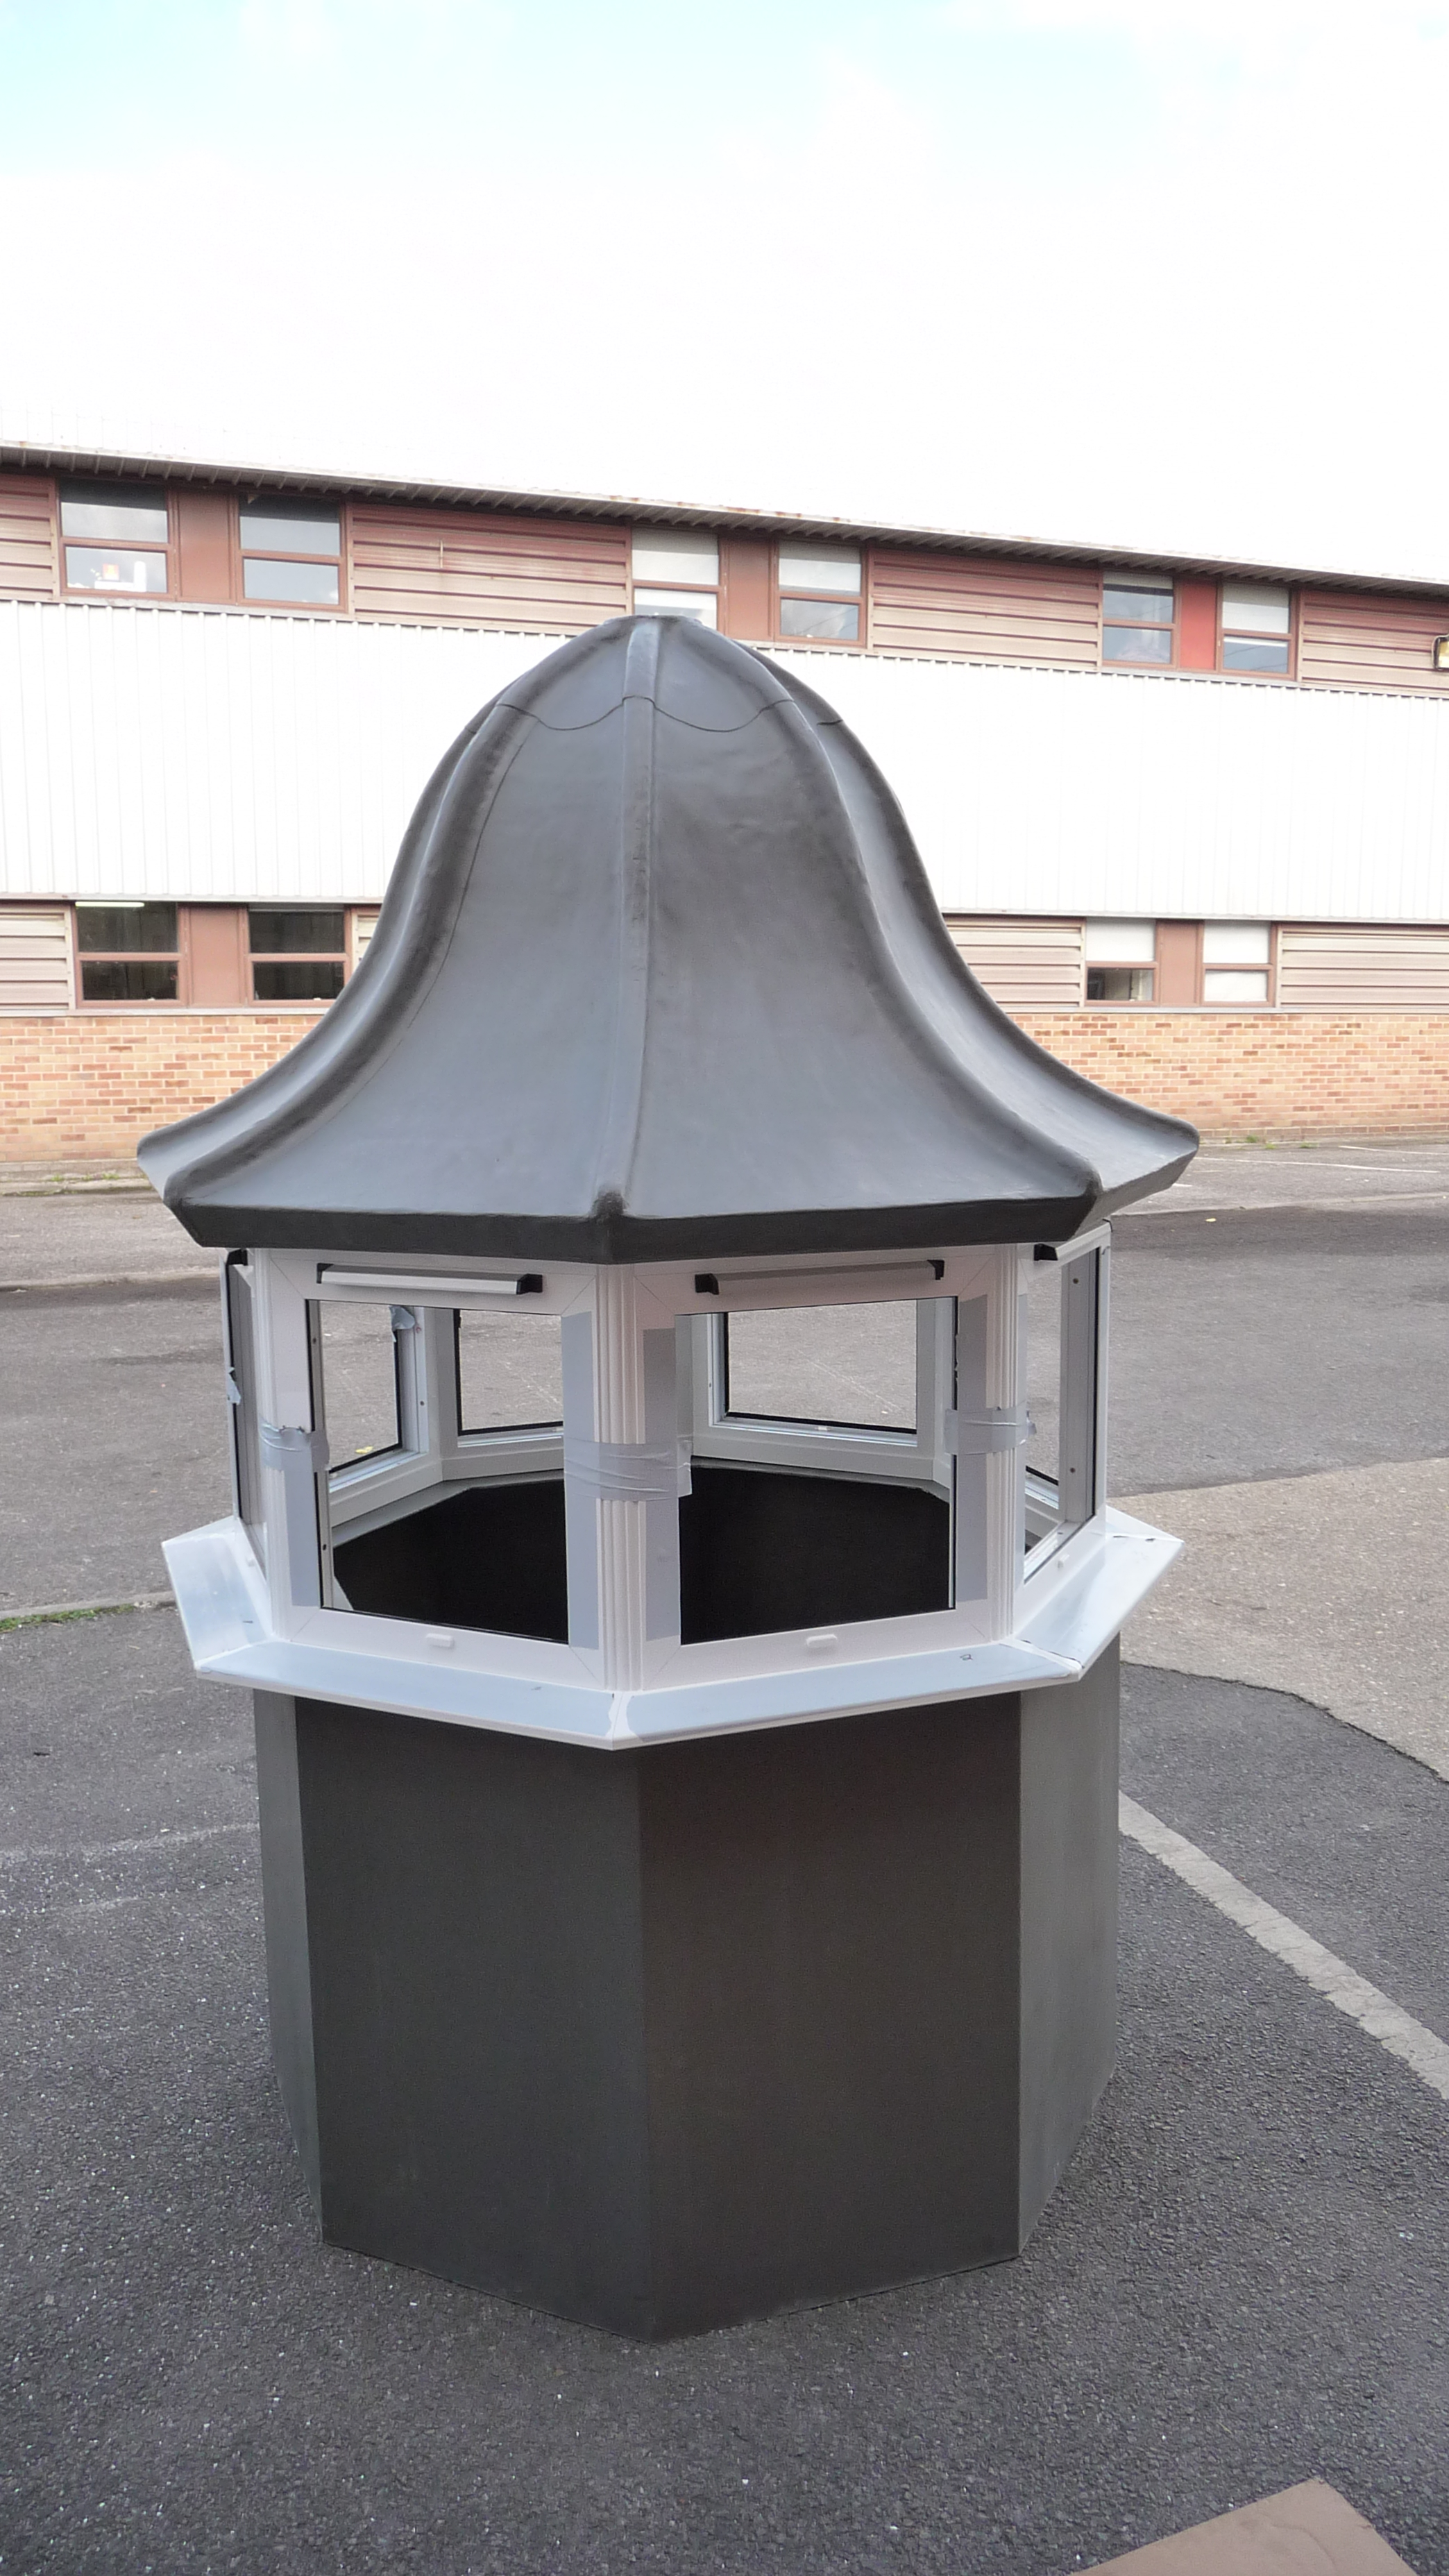 Octagonal roof turret